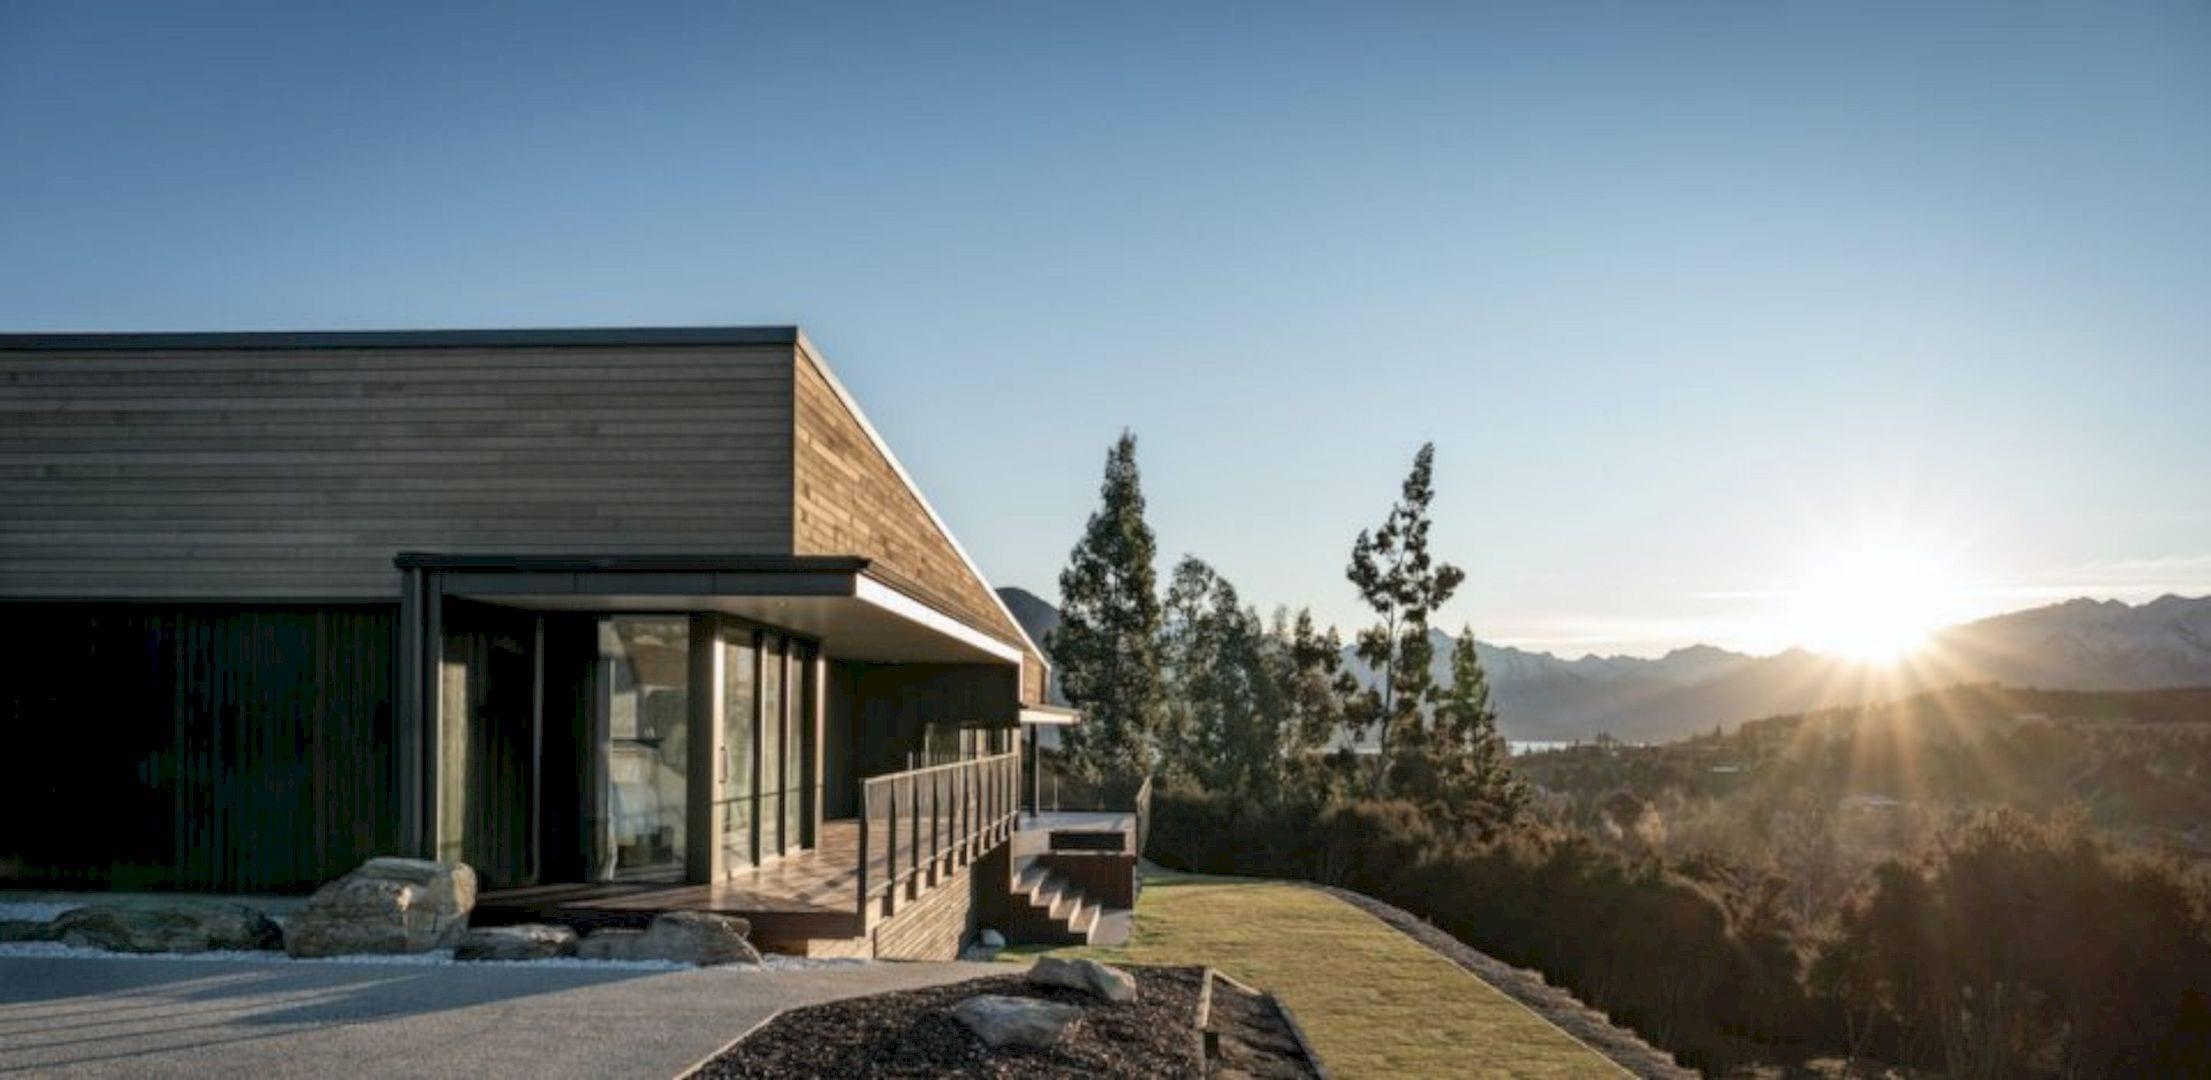 Hidden Hills Retreat By Condon Scott Architects 5